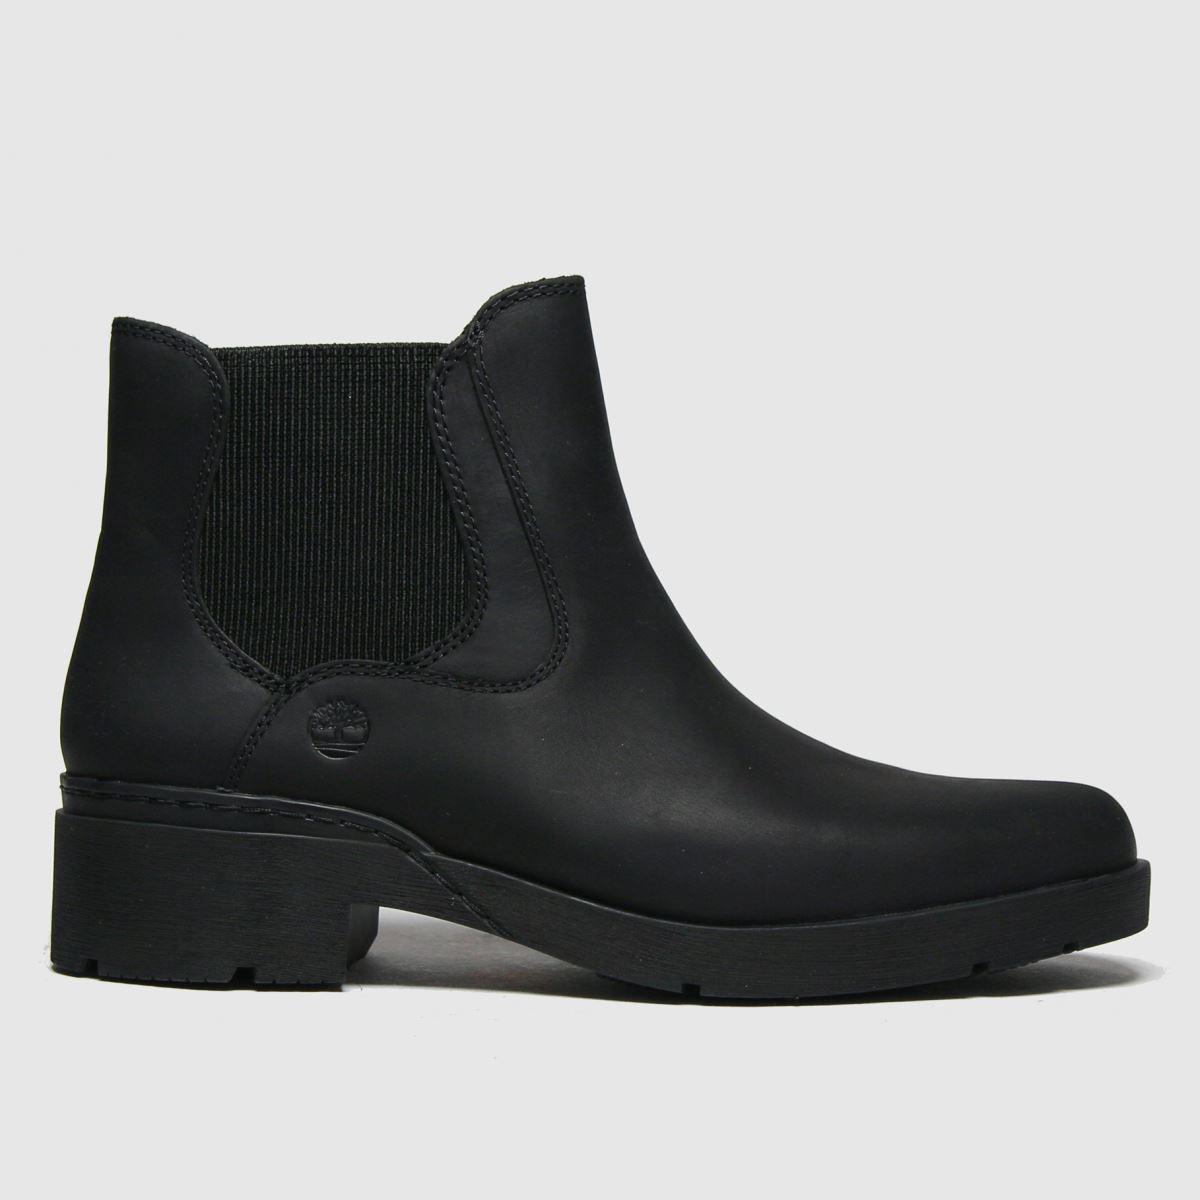 Timberland Black Graceyn Boots